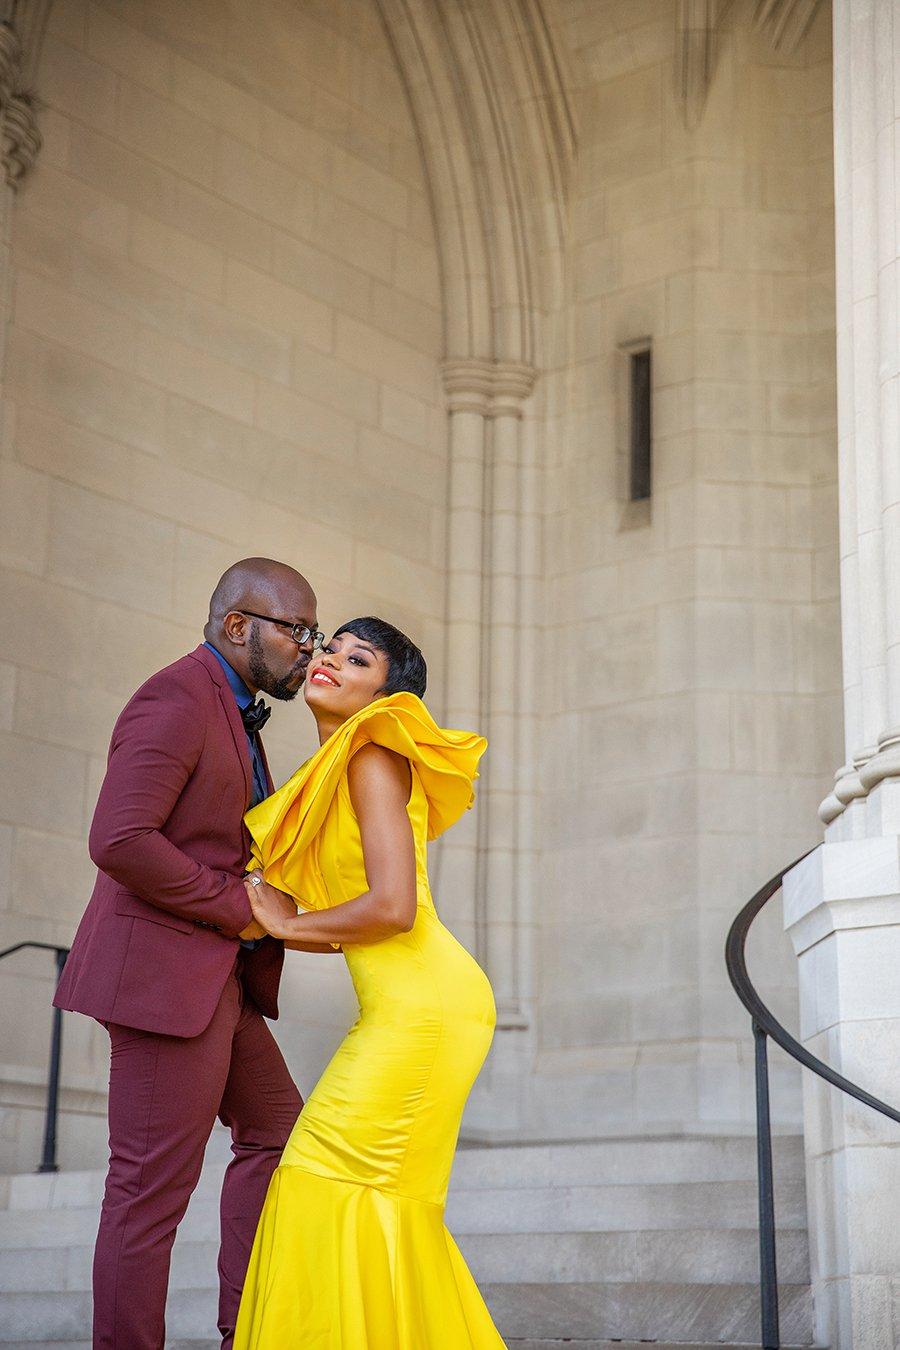 stella-adewunmi-of-jadore-fashion-blog-shares-black-love-matter-black-couple